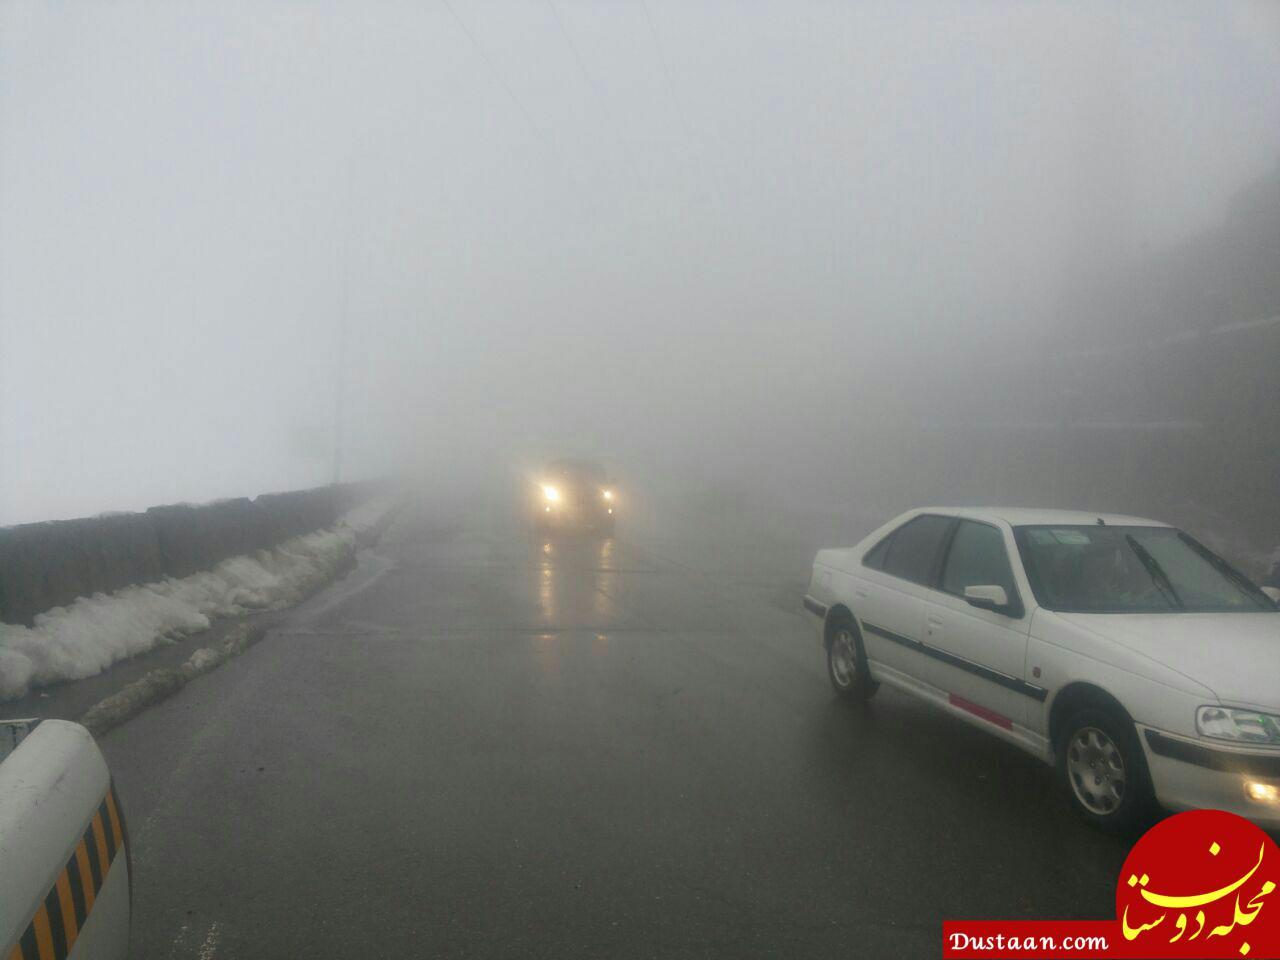 www.dustaan.com هراز و فیروزکوه پوشیده از برف و مه آلود است